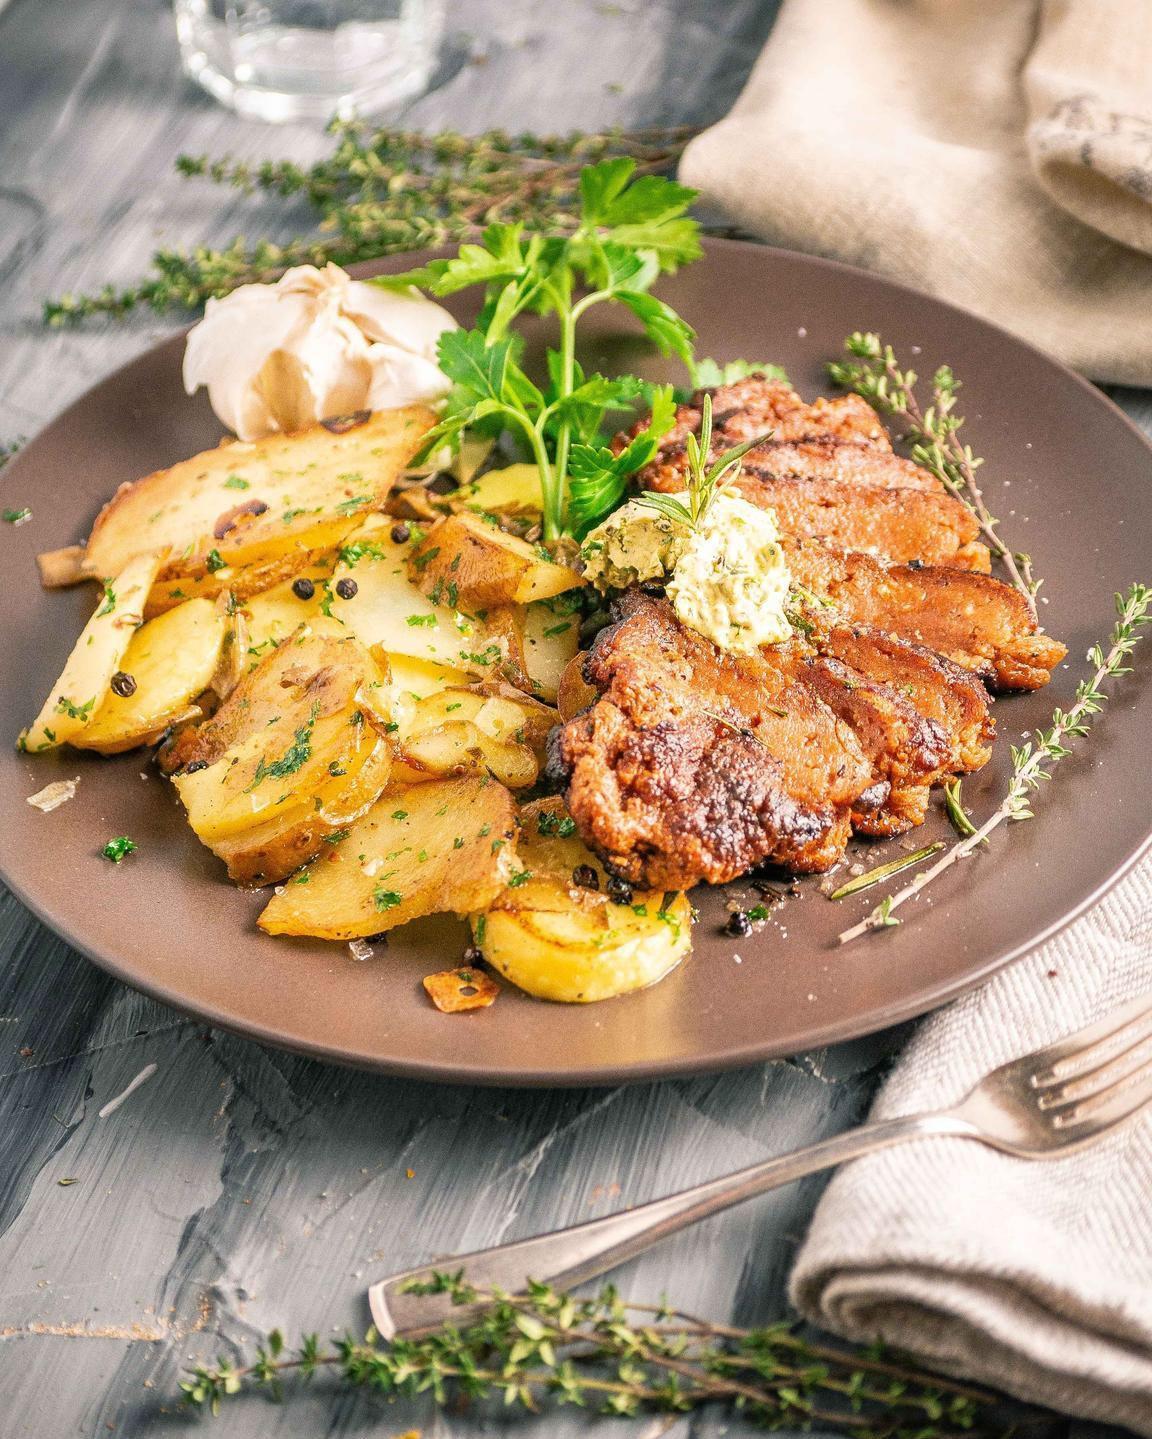 vegan german food made on a free veecoco online vegan cooking courses